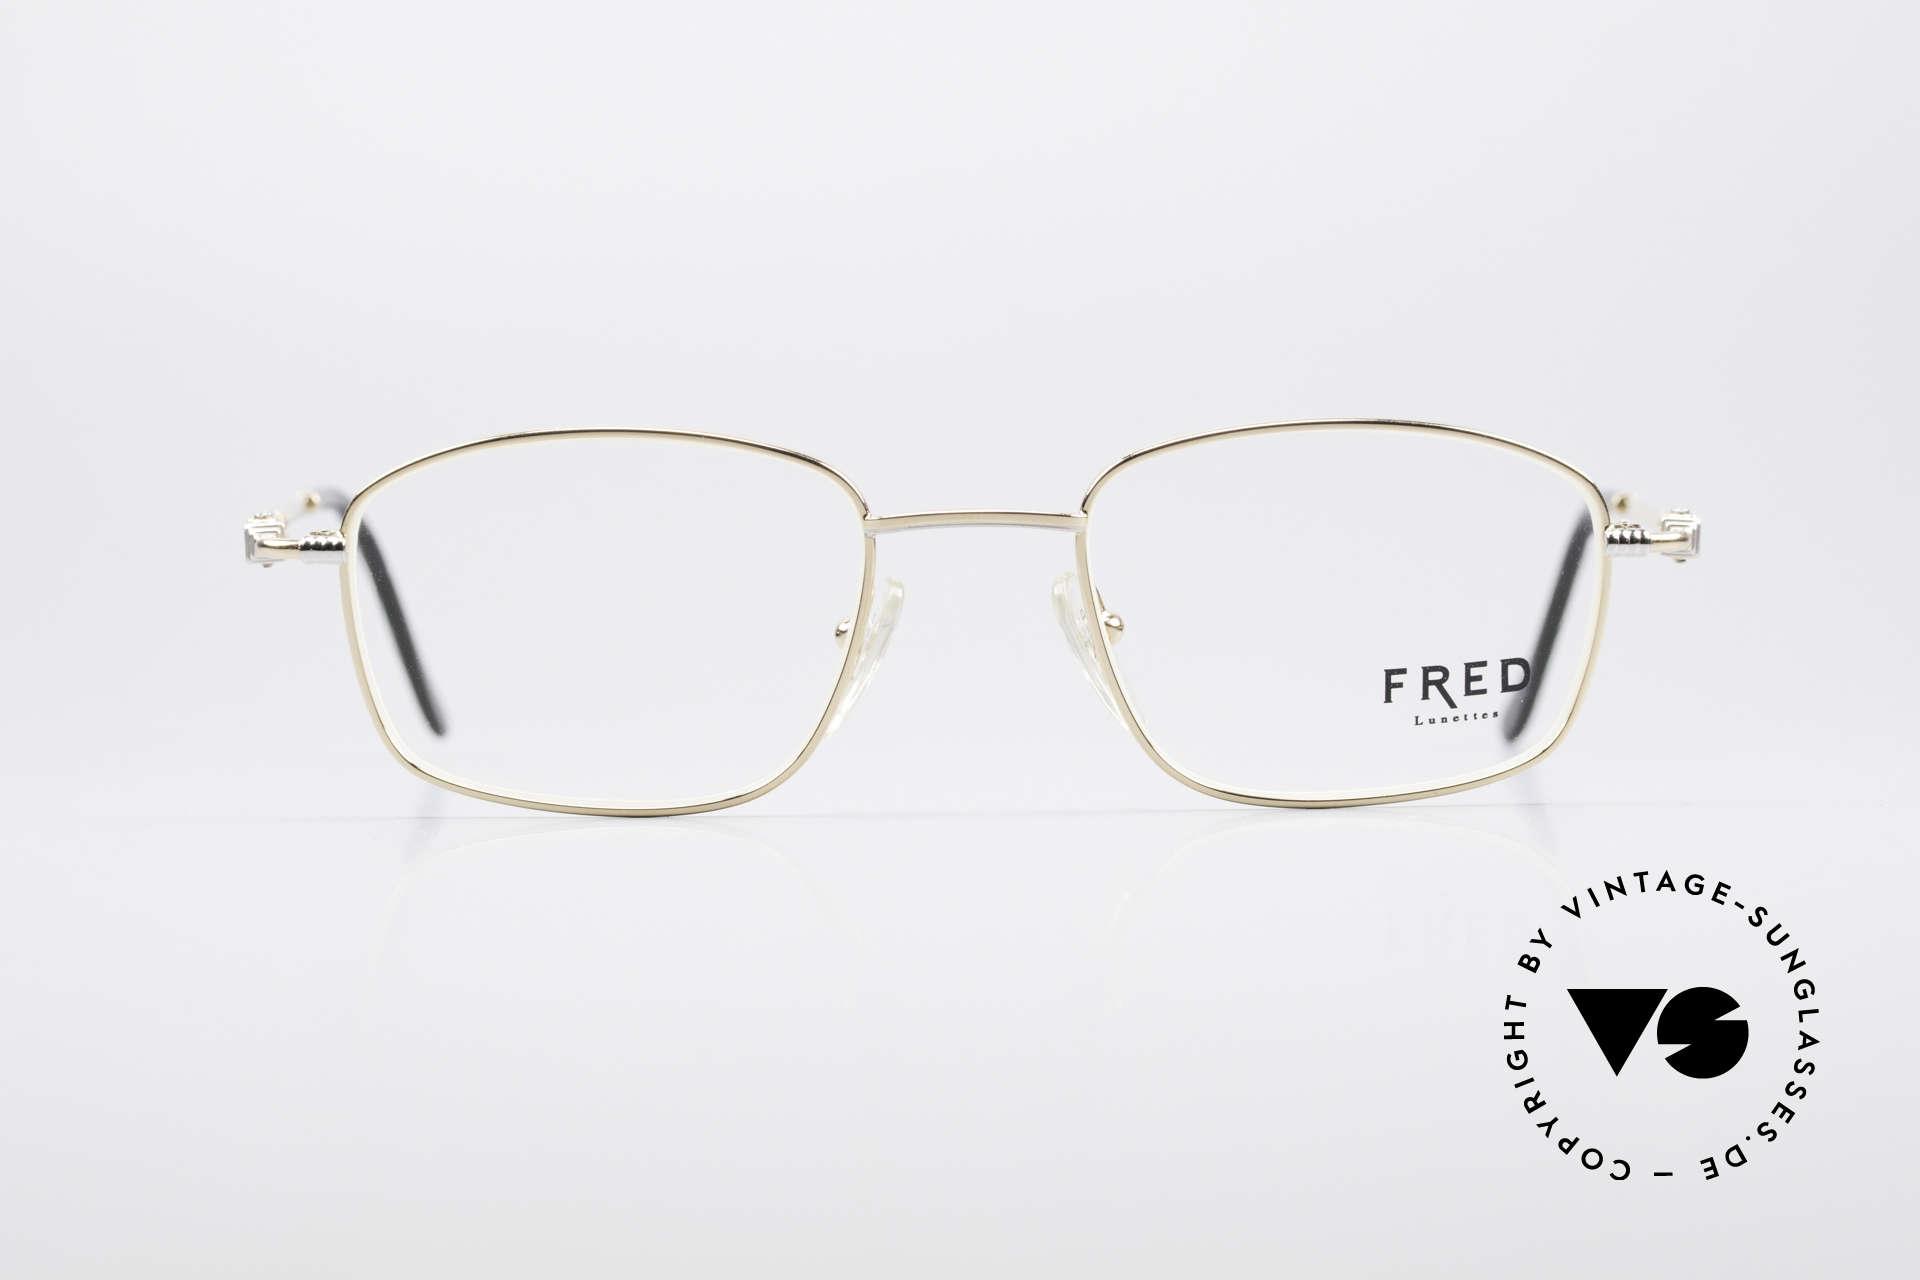 64cba9de29 Glasses Fred Falkland 90's Luxury Eyeglasses | Vintage Sunglasses